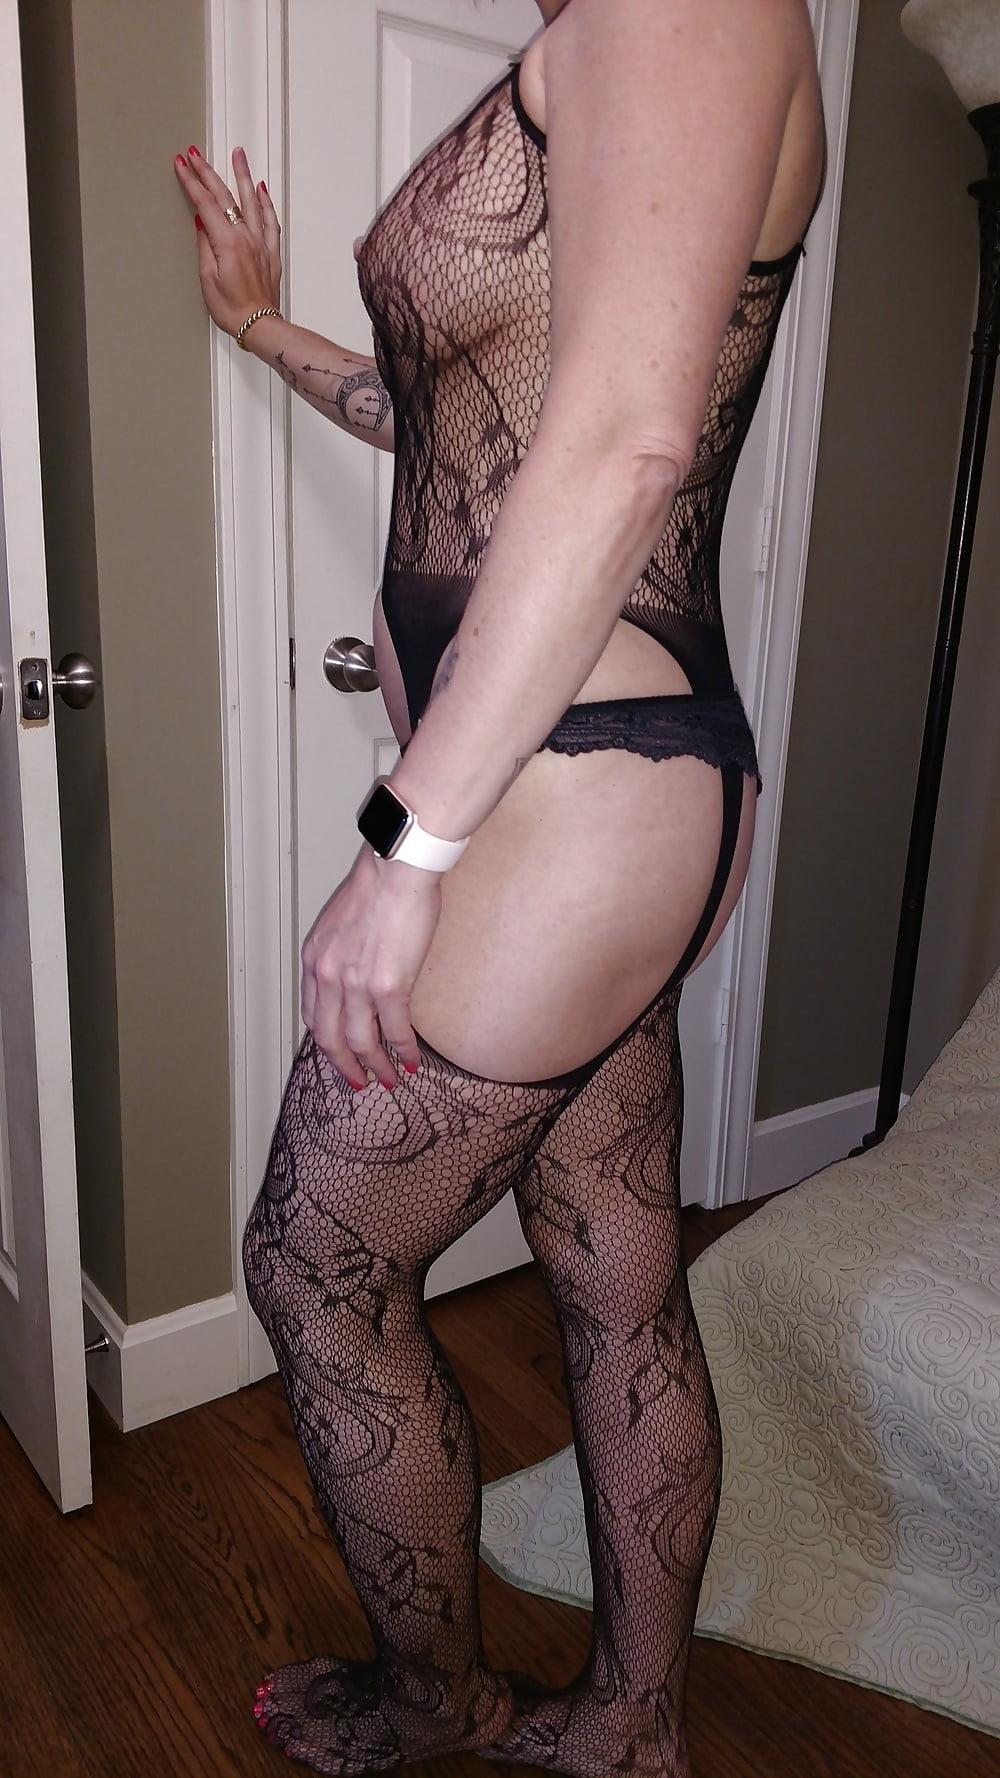 Milfs in lingerie pics-3279